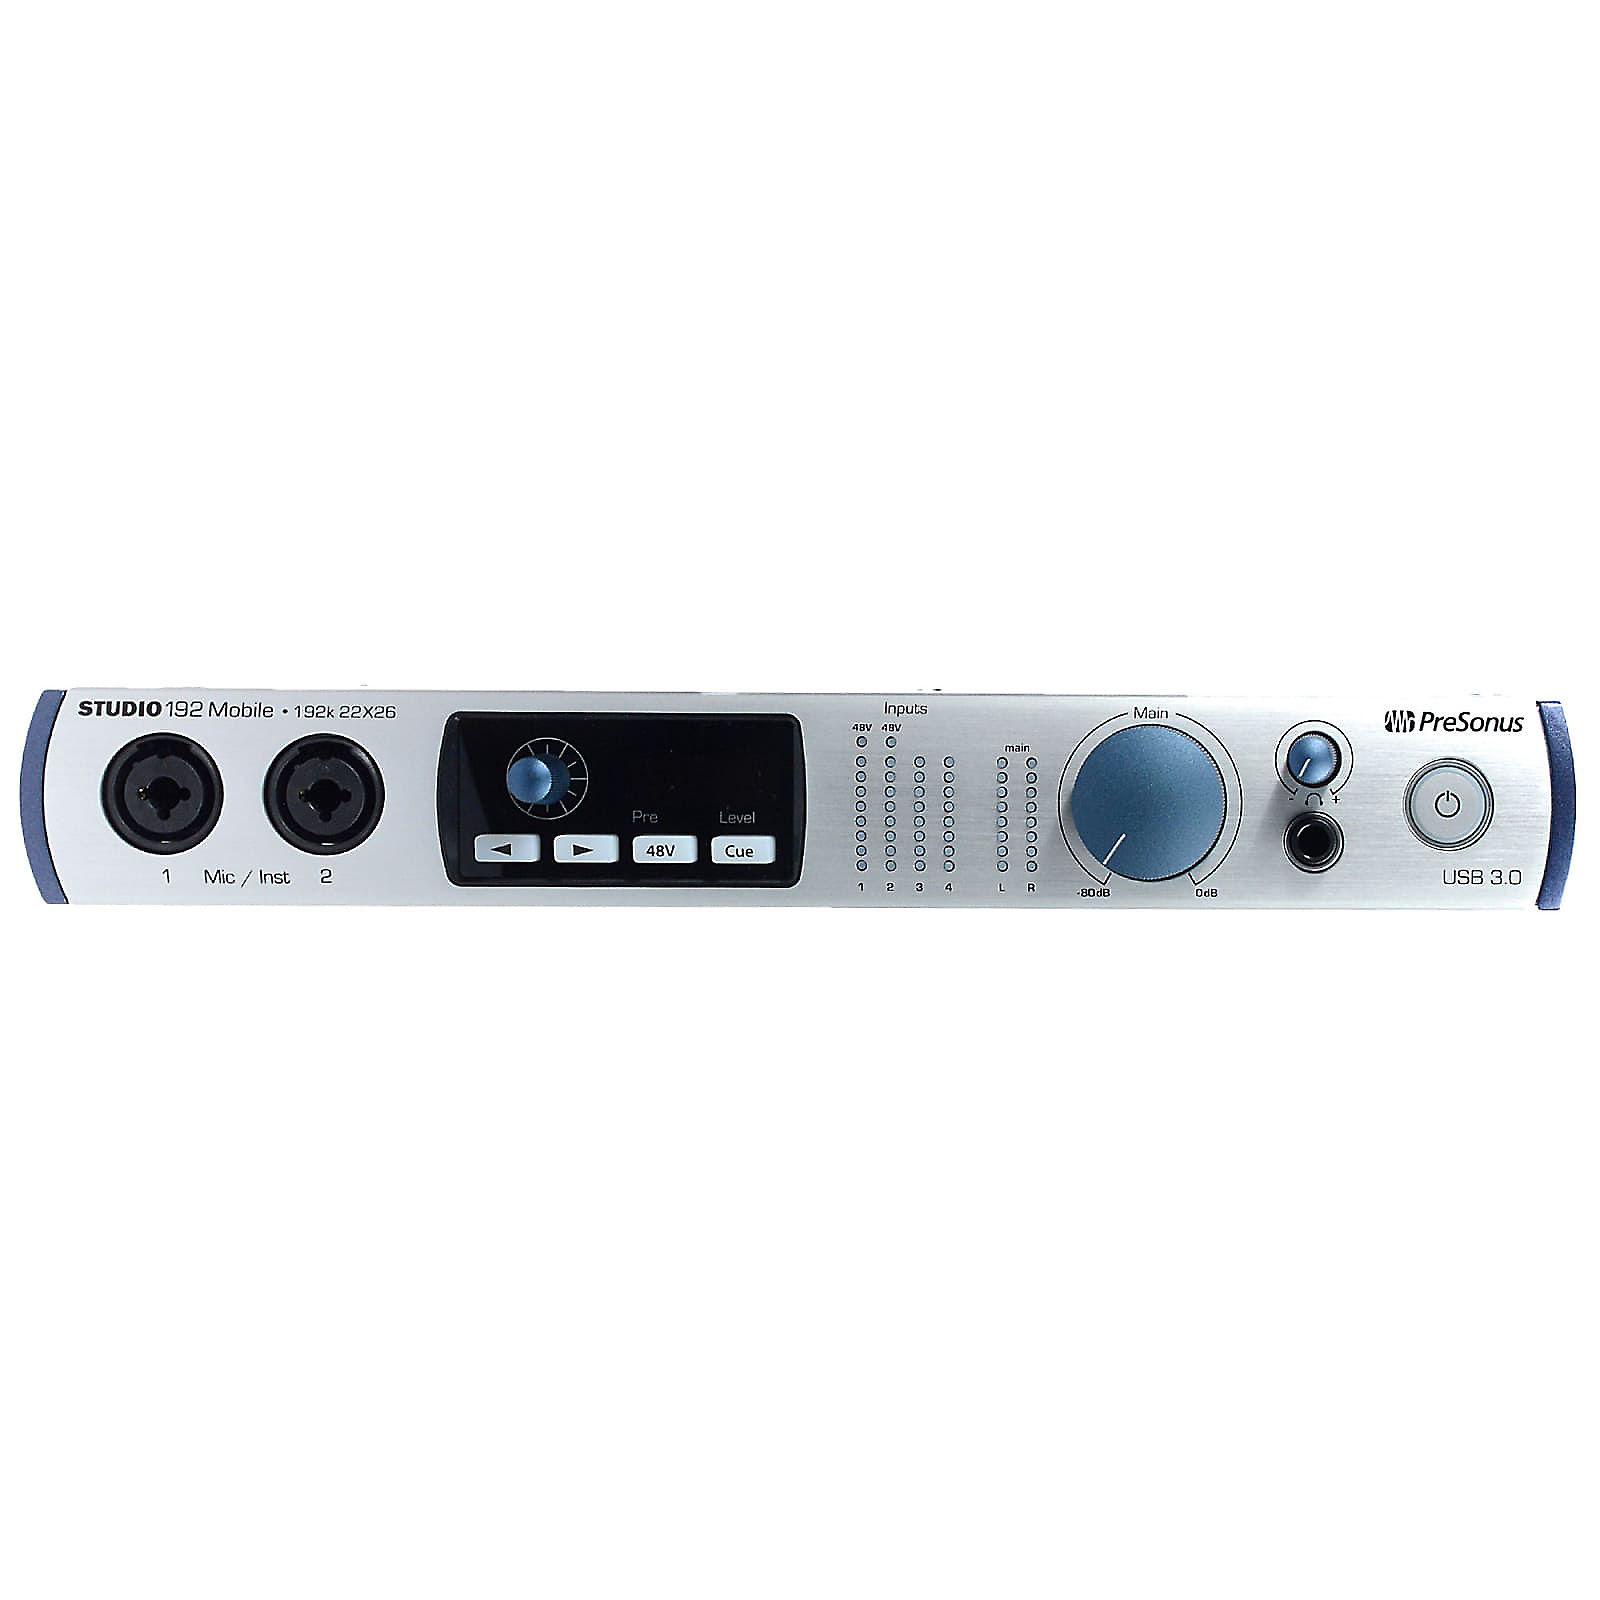 Presonus Studio 192 Mobile USB Audio Interface